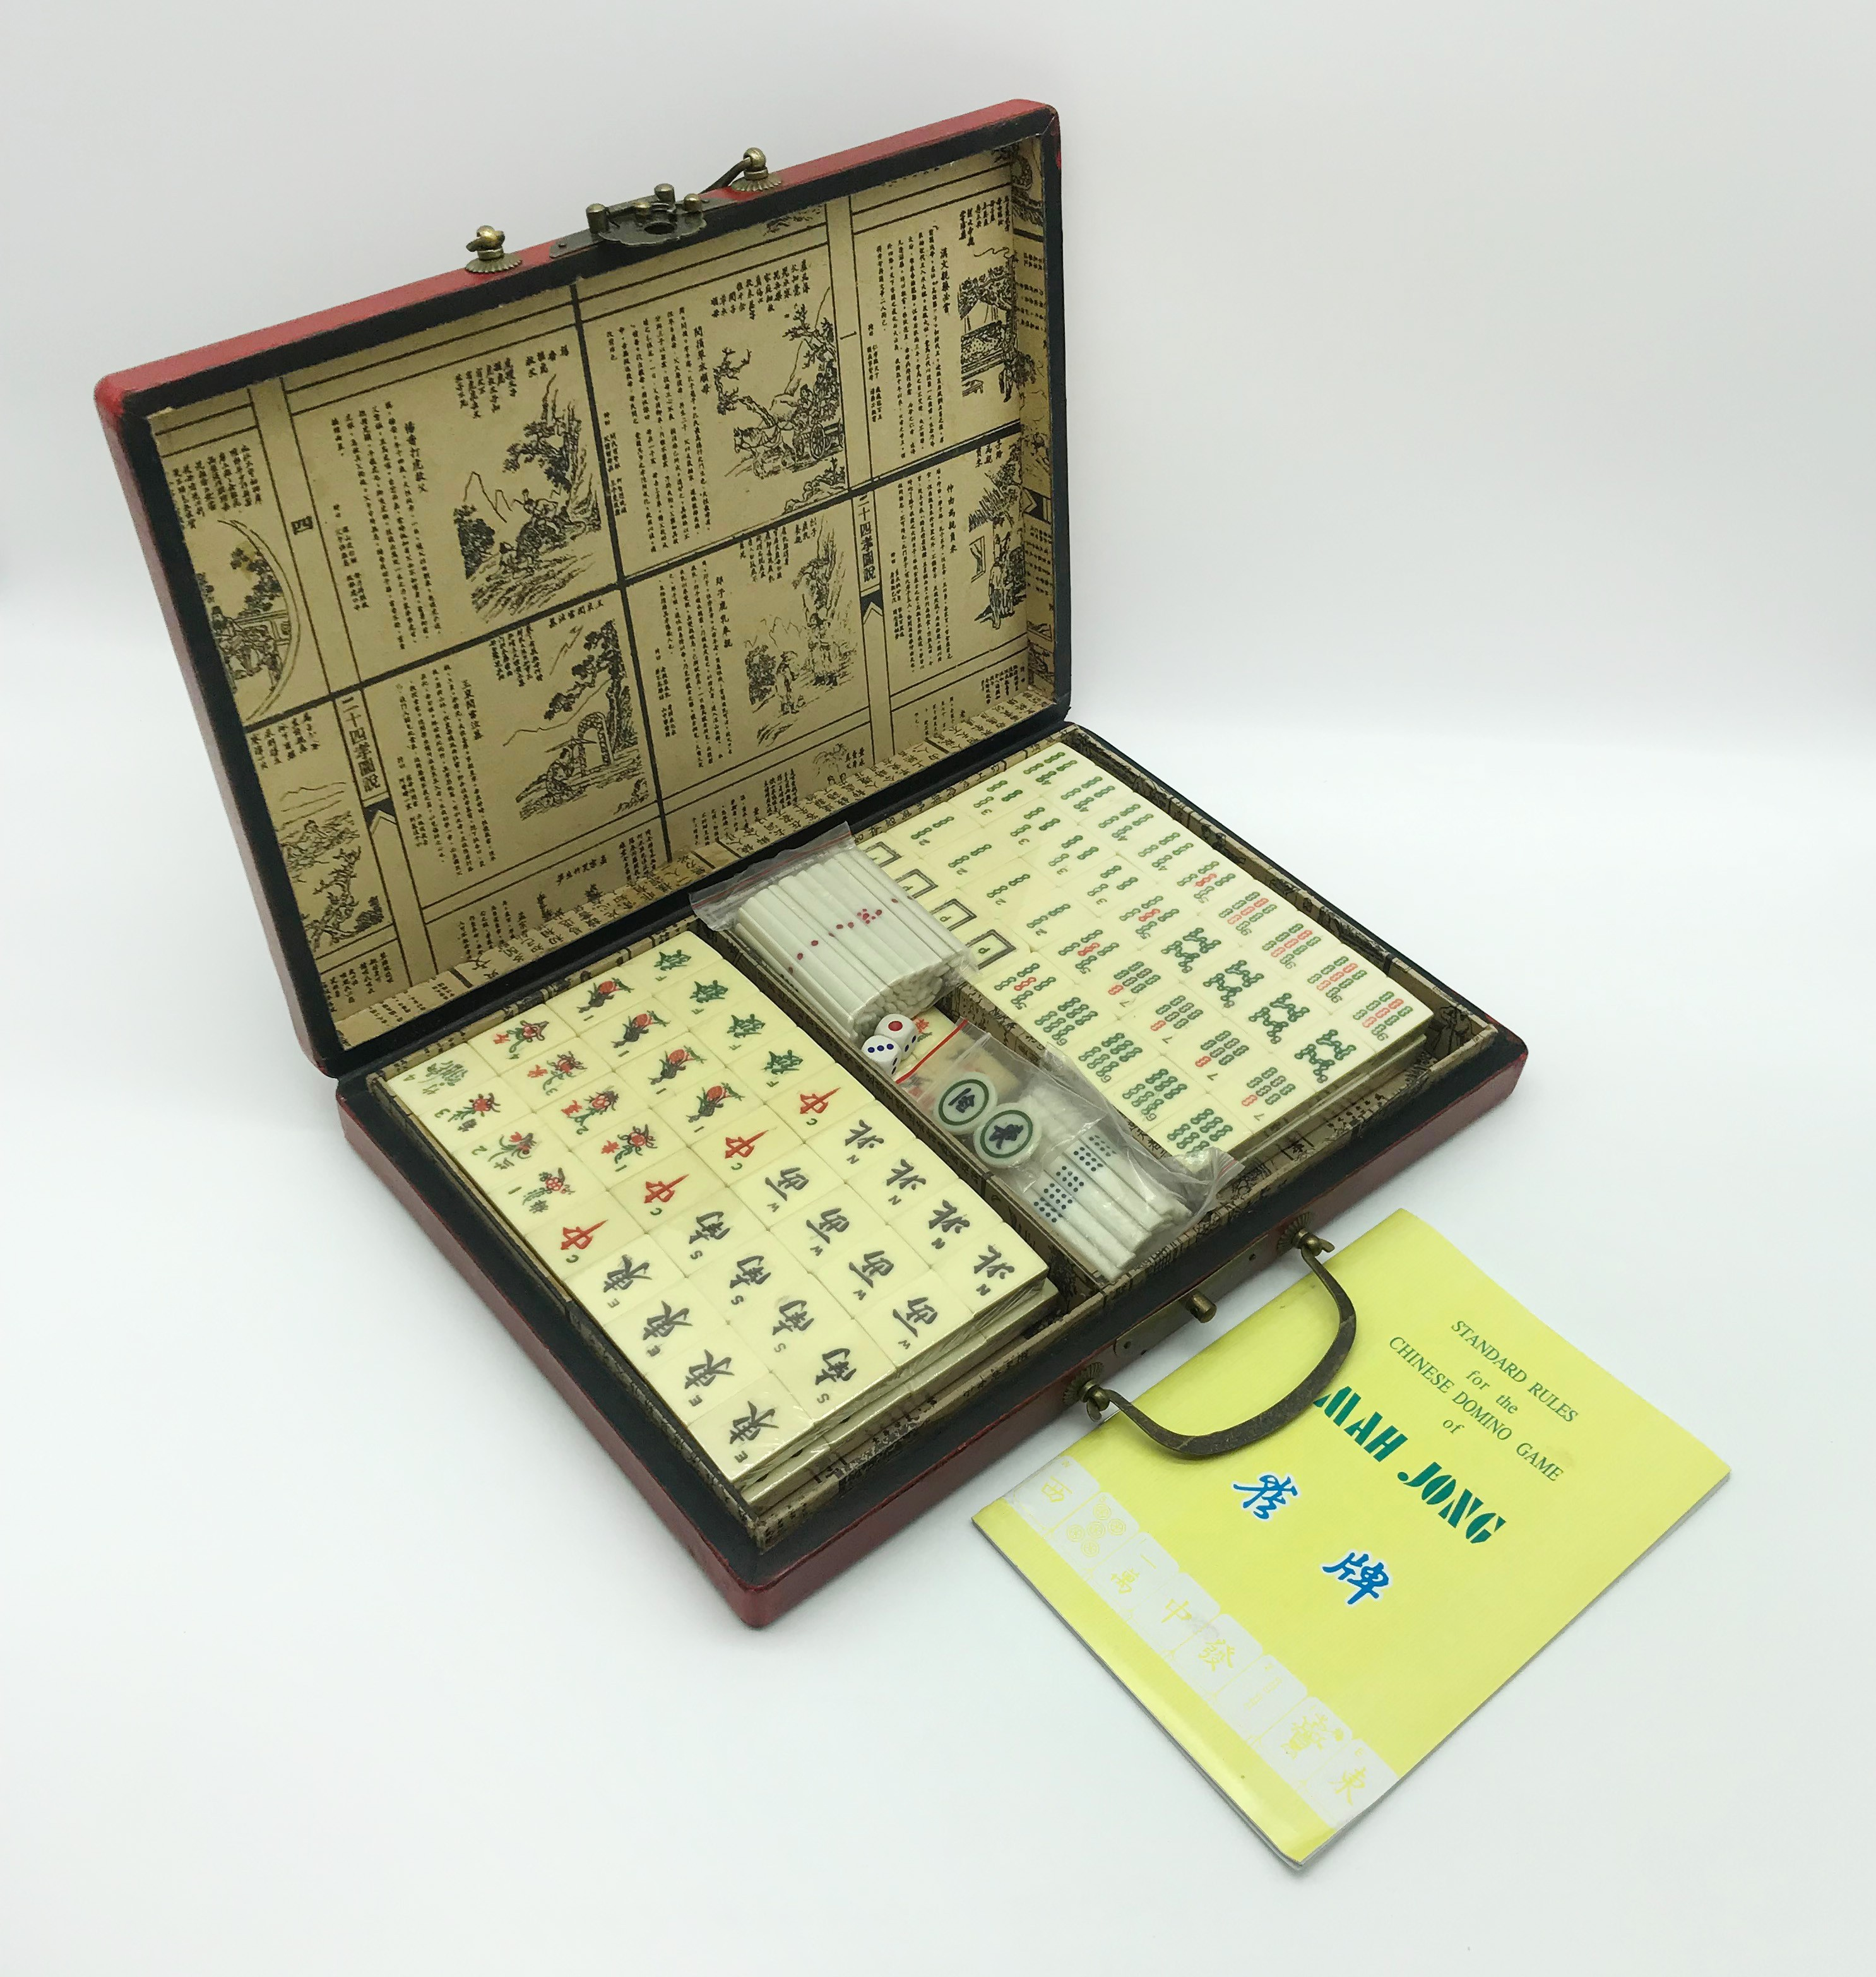 Lot 100 - VINTAGE MAH JONGG GAME CASED